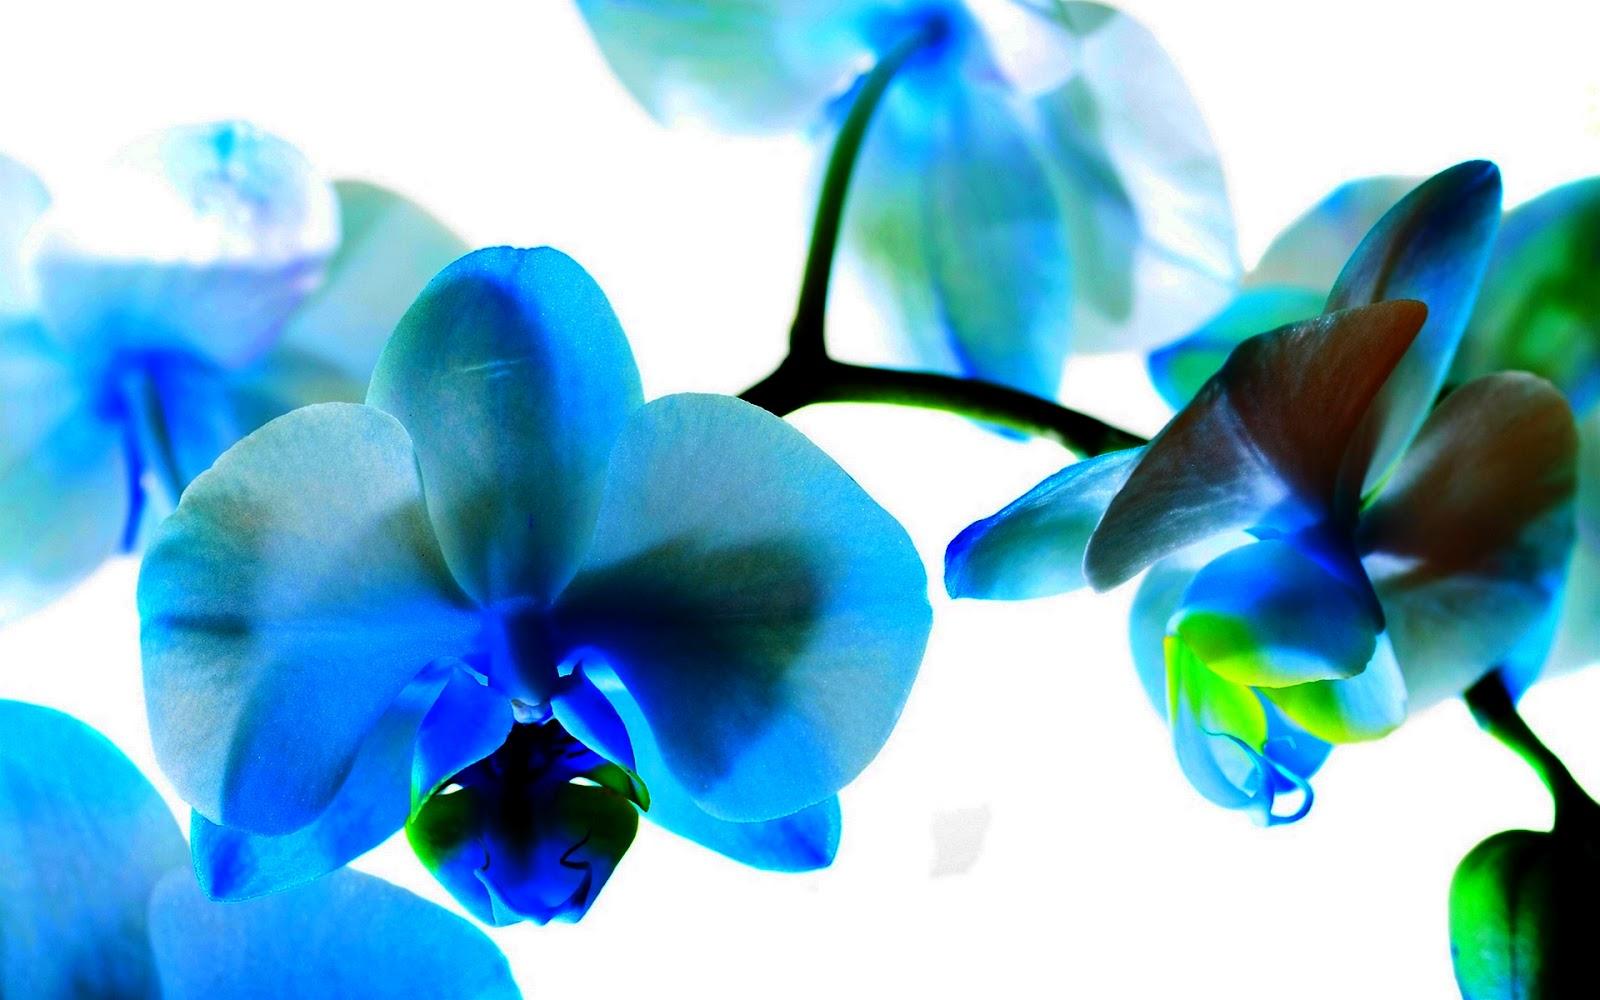 http://2.bp.blogspot.com/-FYbBXYBupmQ/UDdC3RqVg9I/AAAAAAAAAr4/MDQSKteEaWc/s1600/1152887-1920x1200-orchid.jpg